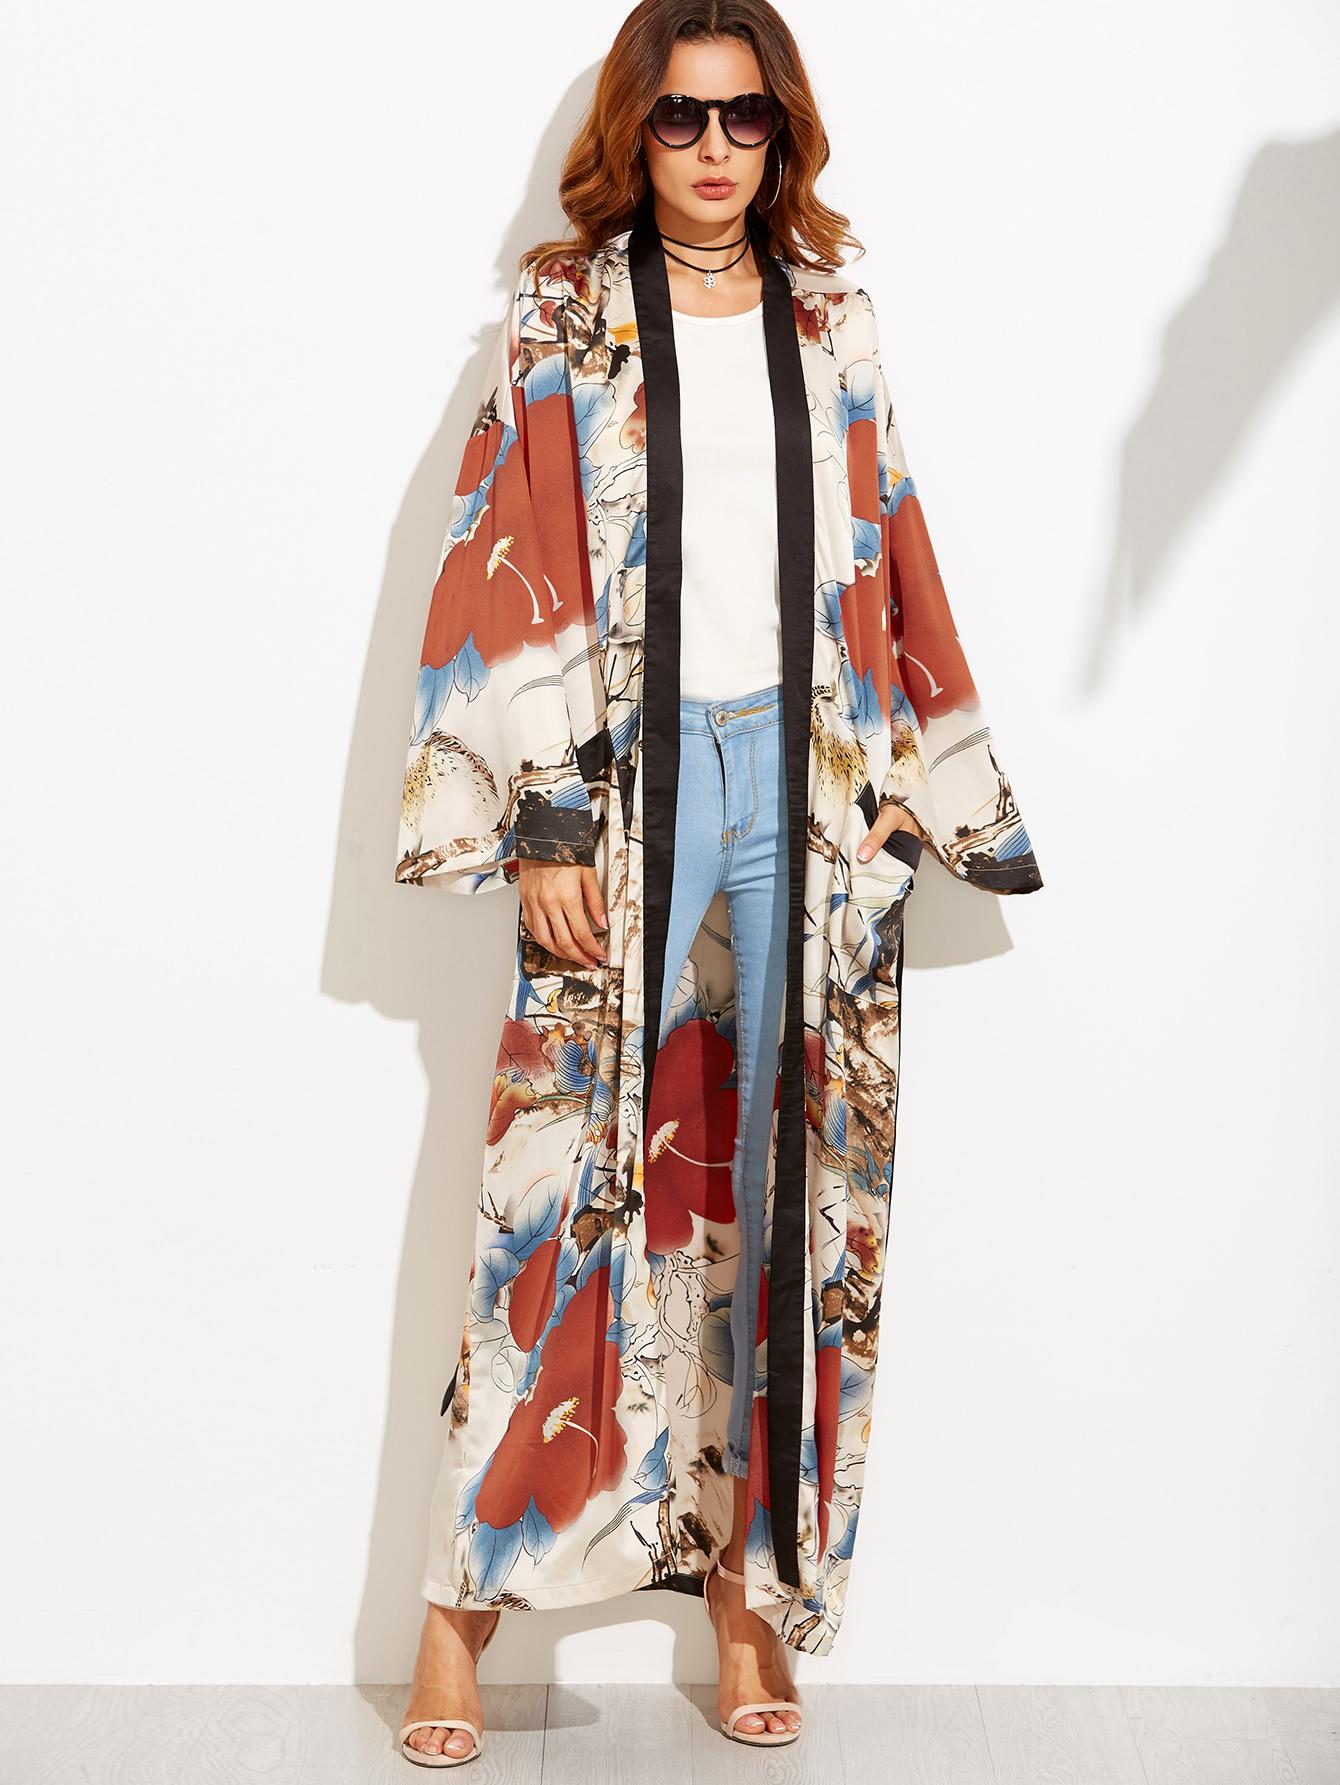 japanese influence on fashion kimono capture models. Black Bedroom Furniture Sets. Home Design Ideas